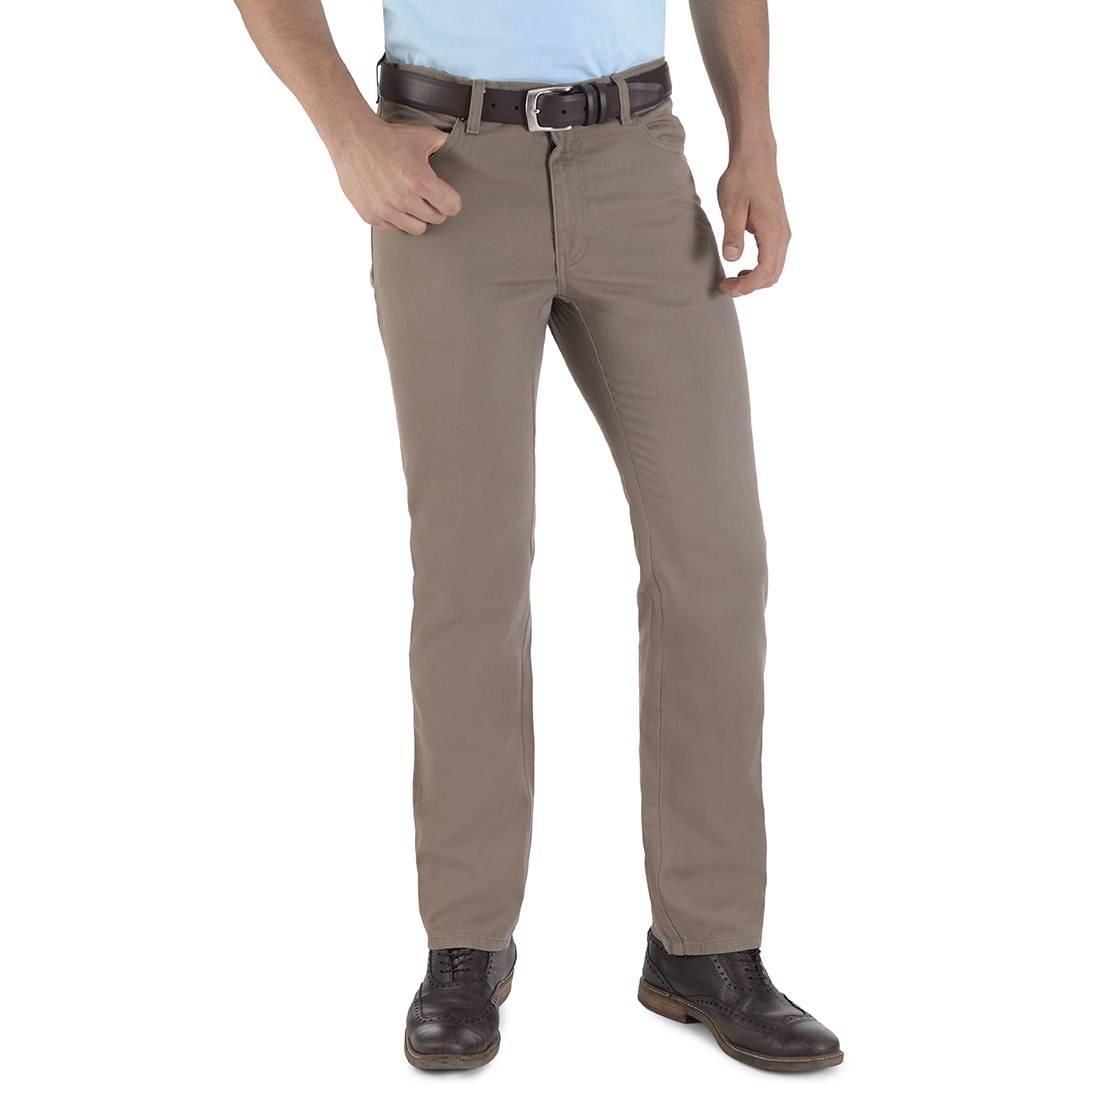 011040055268-01-Pantalon-Casual-Classic-Fit-Kaki-yale